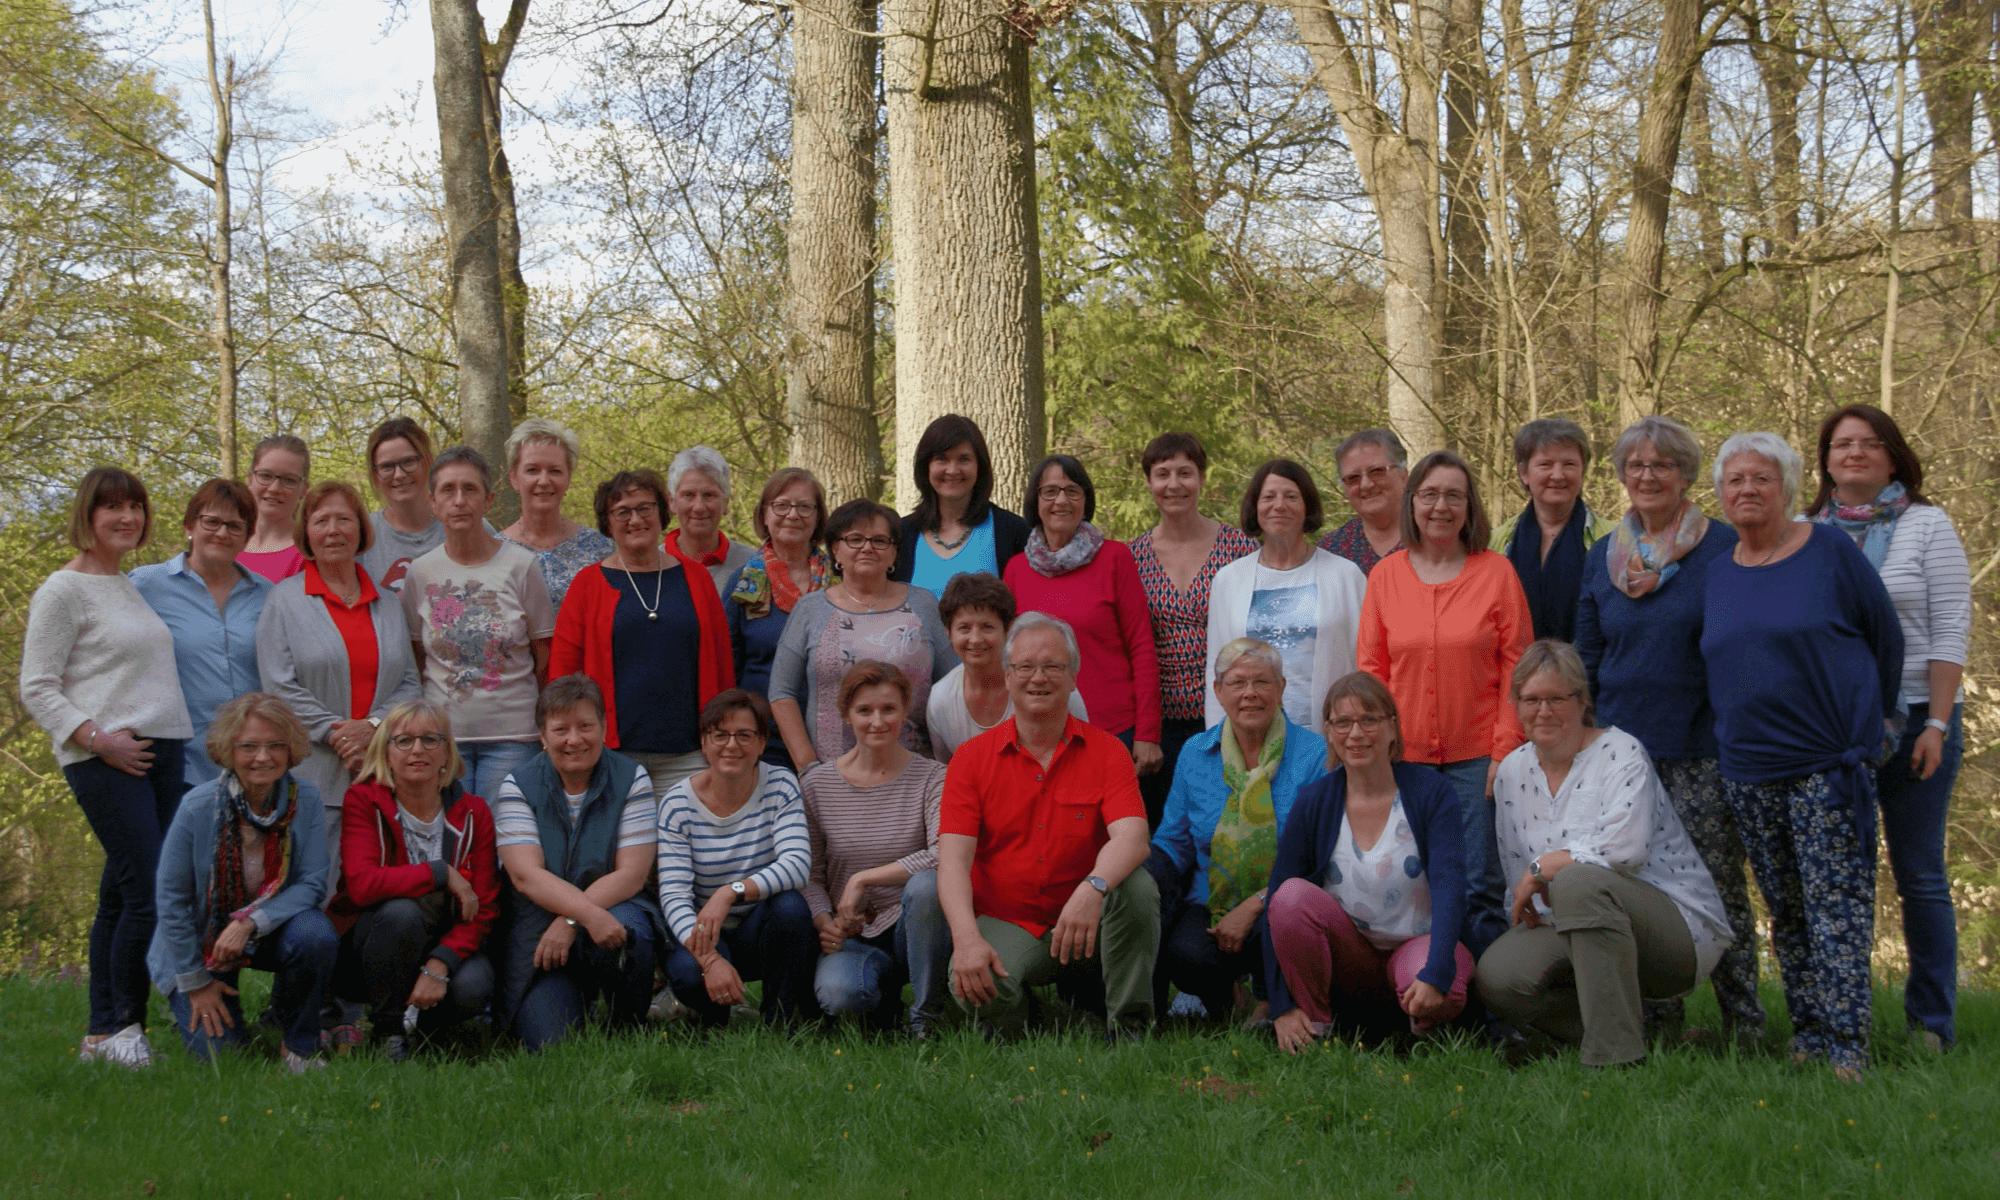 Frauenchor Vocalitas